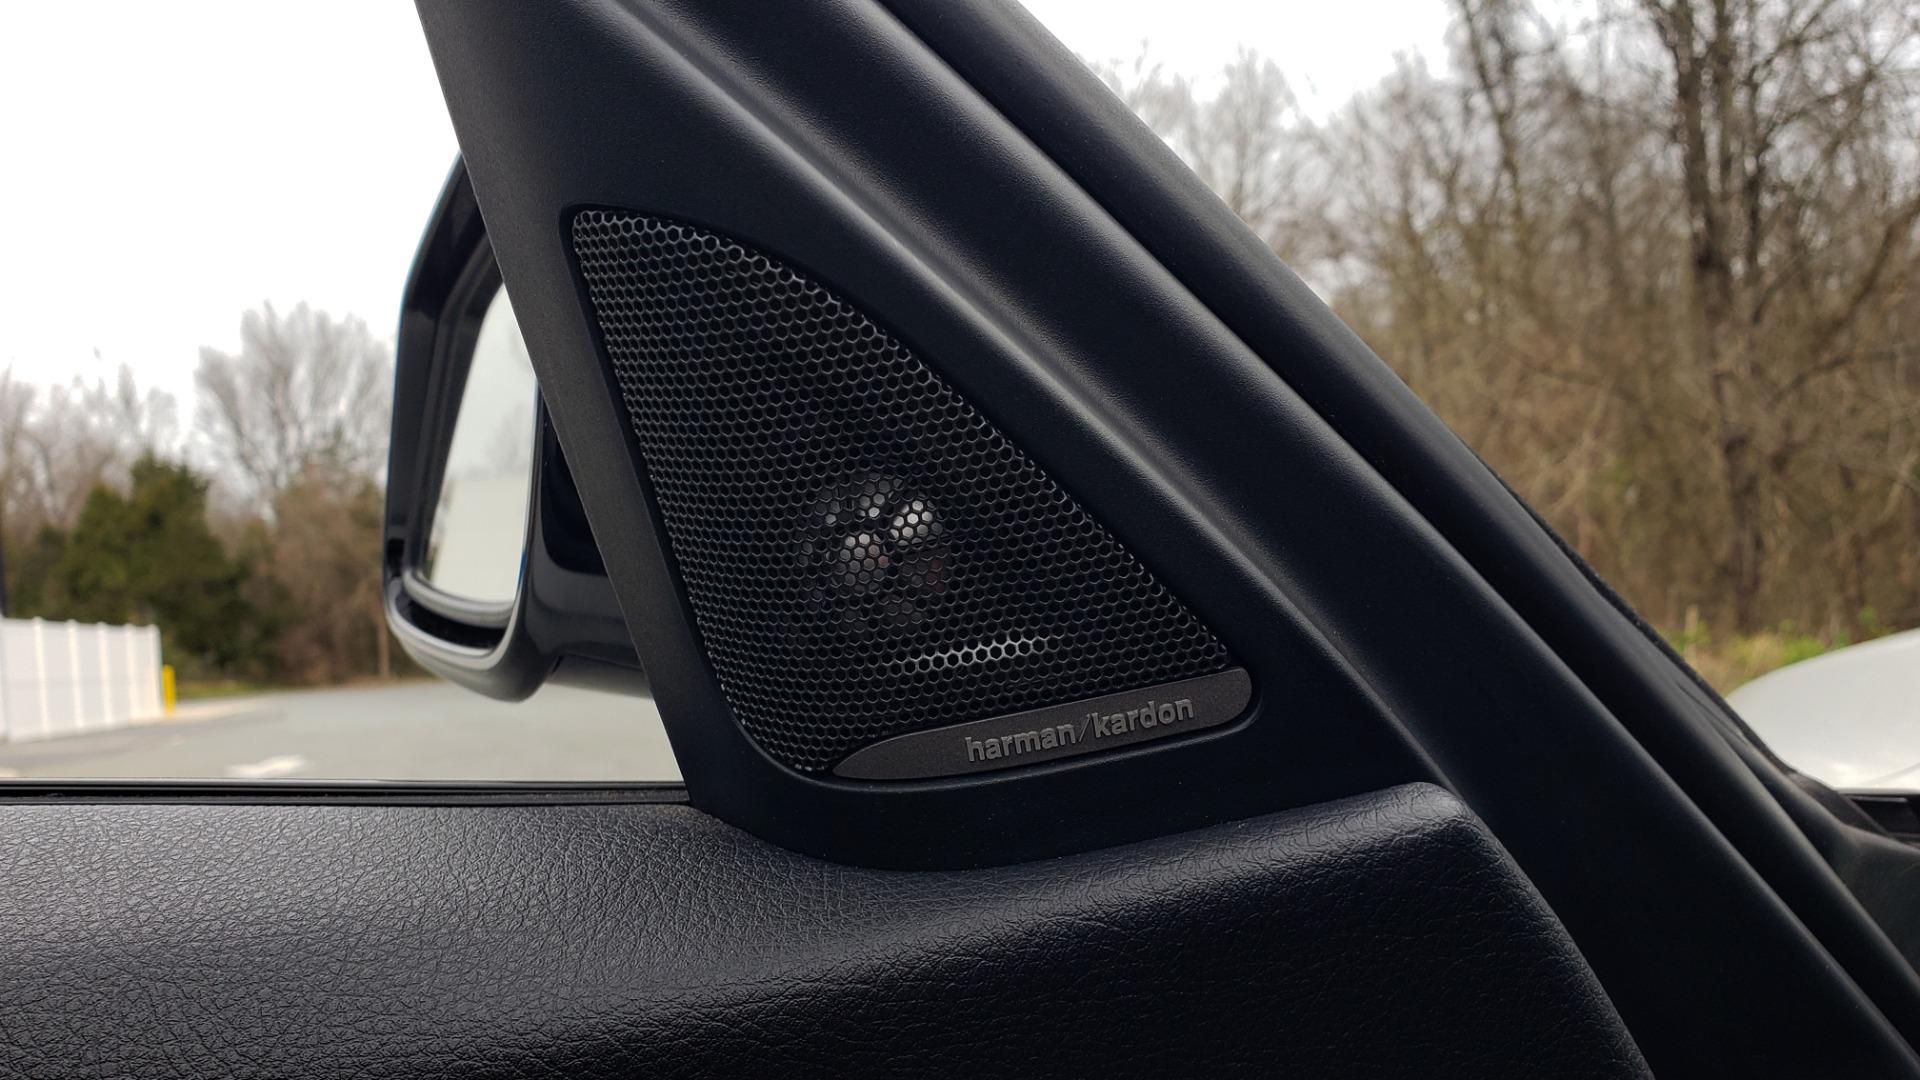 Used 2015 BMW 3 Series 335I M-SPORT / PREM PKG / HK SND / SUNROOF / REARVIEW for sale Sold at Formula Imports in Charlotte NC 28227 34